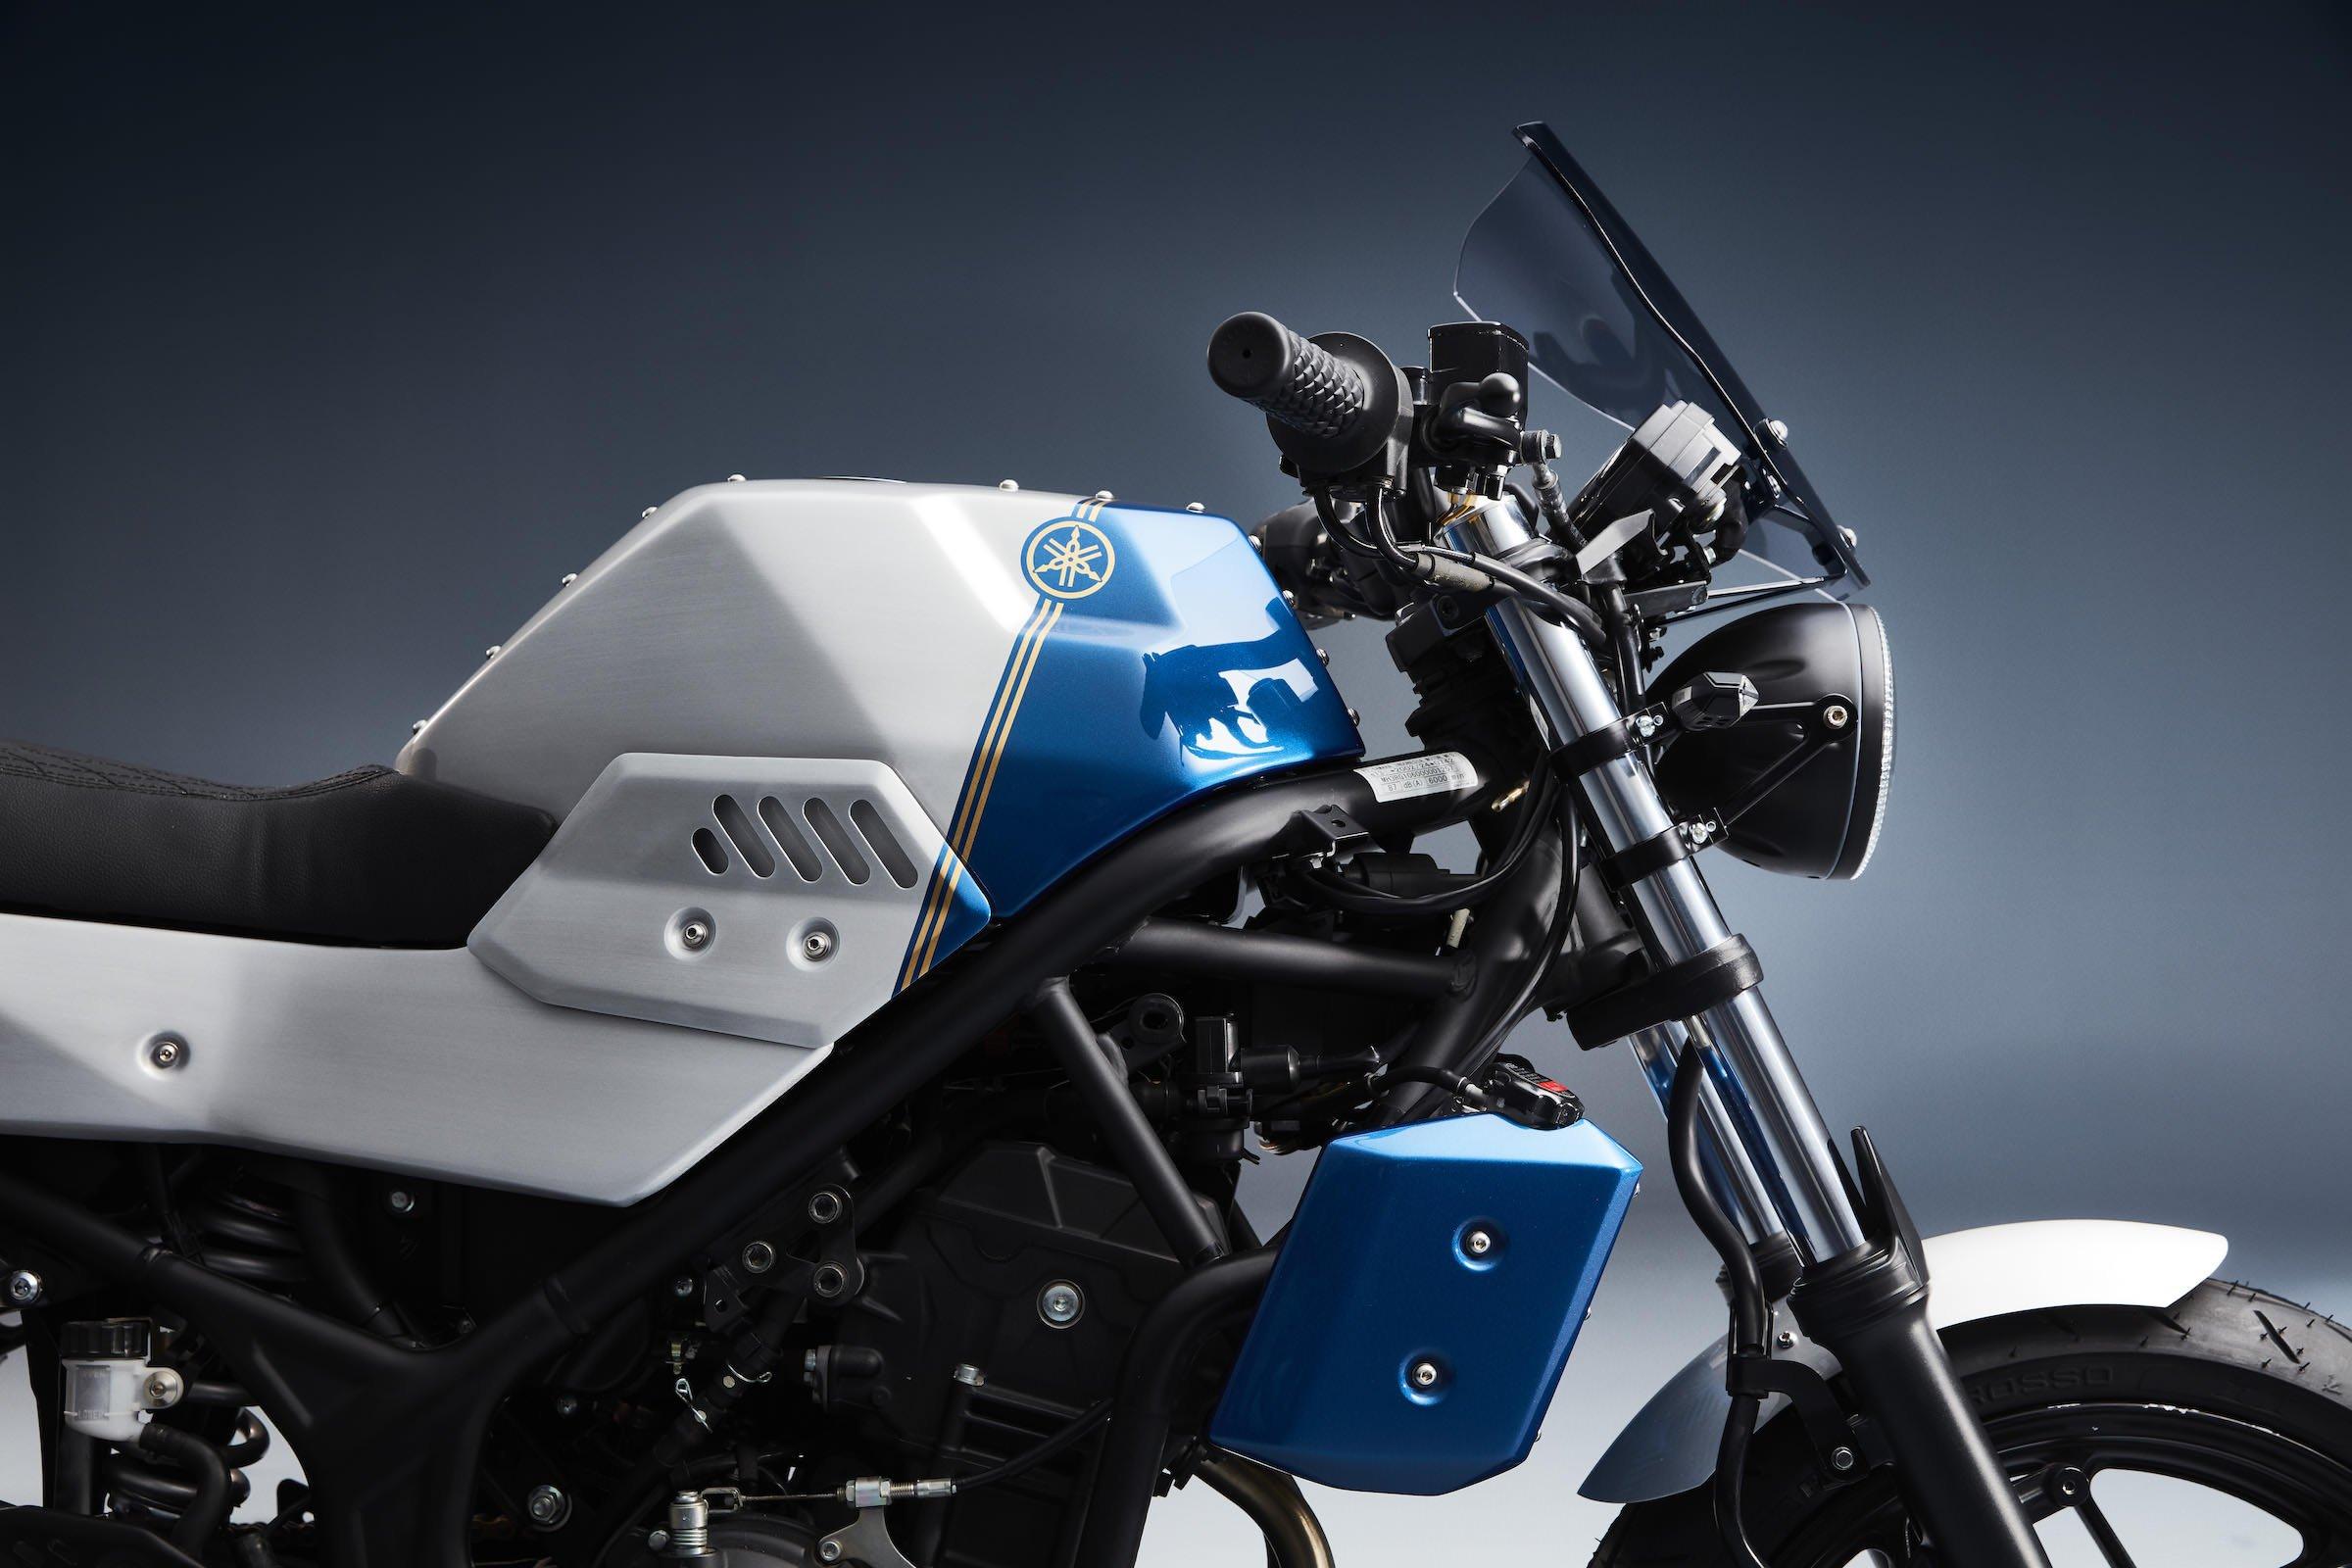 2018 Yamaha Motorcycles >> The Bunker Customs Janus Full Body Kit For The Yamaha MT-25 & MT-03